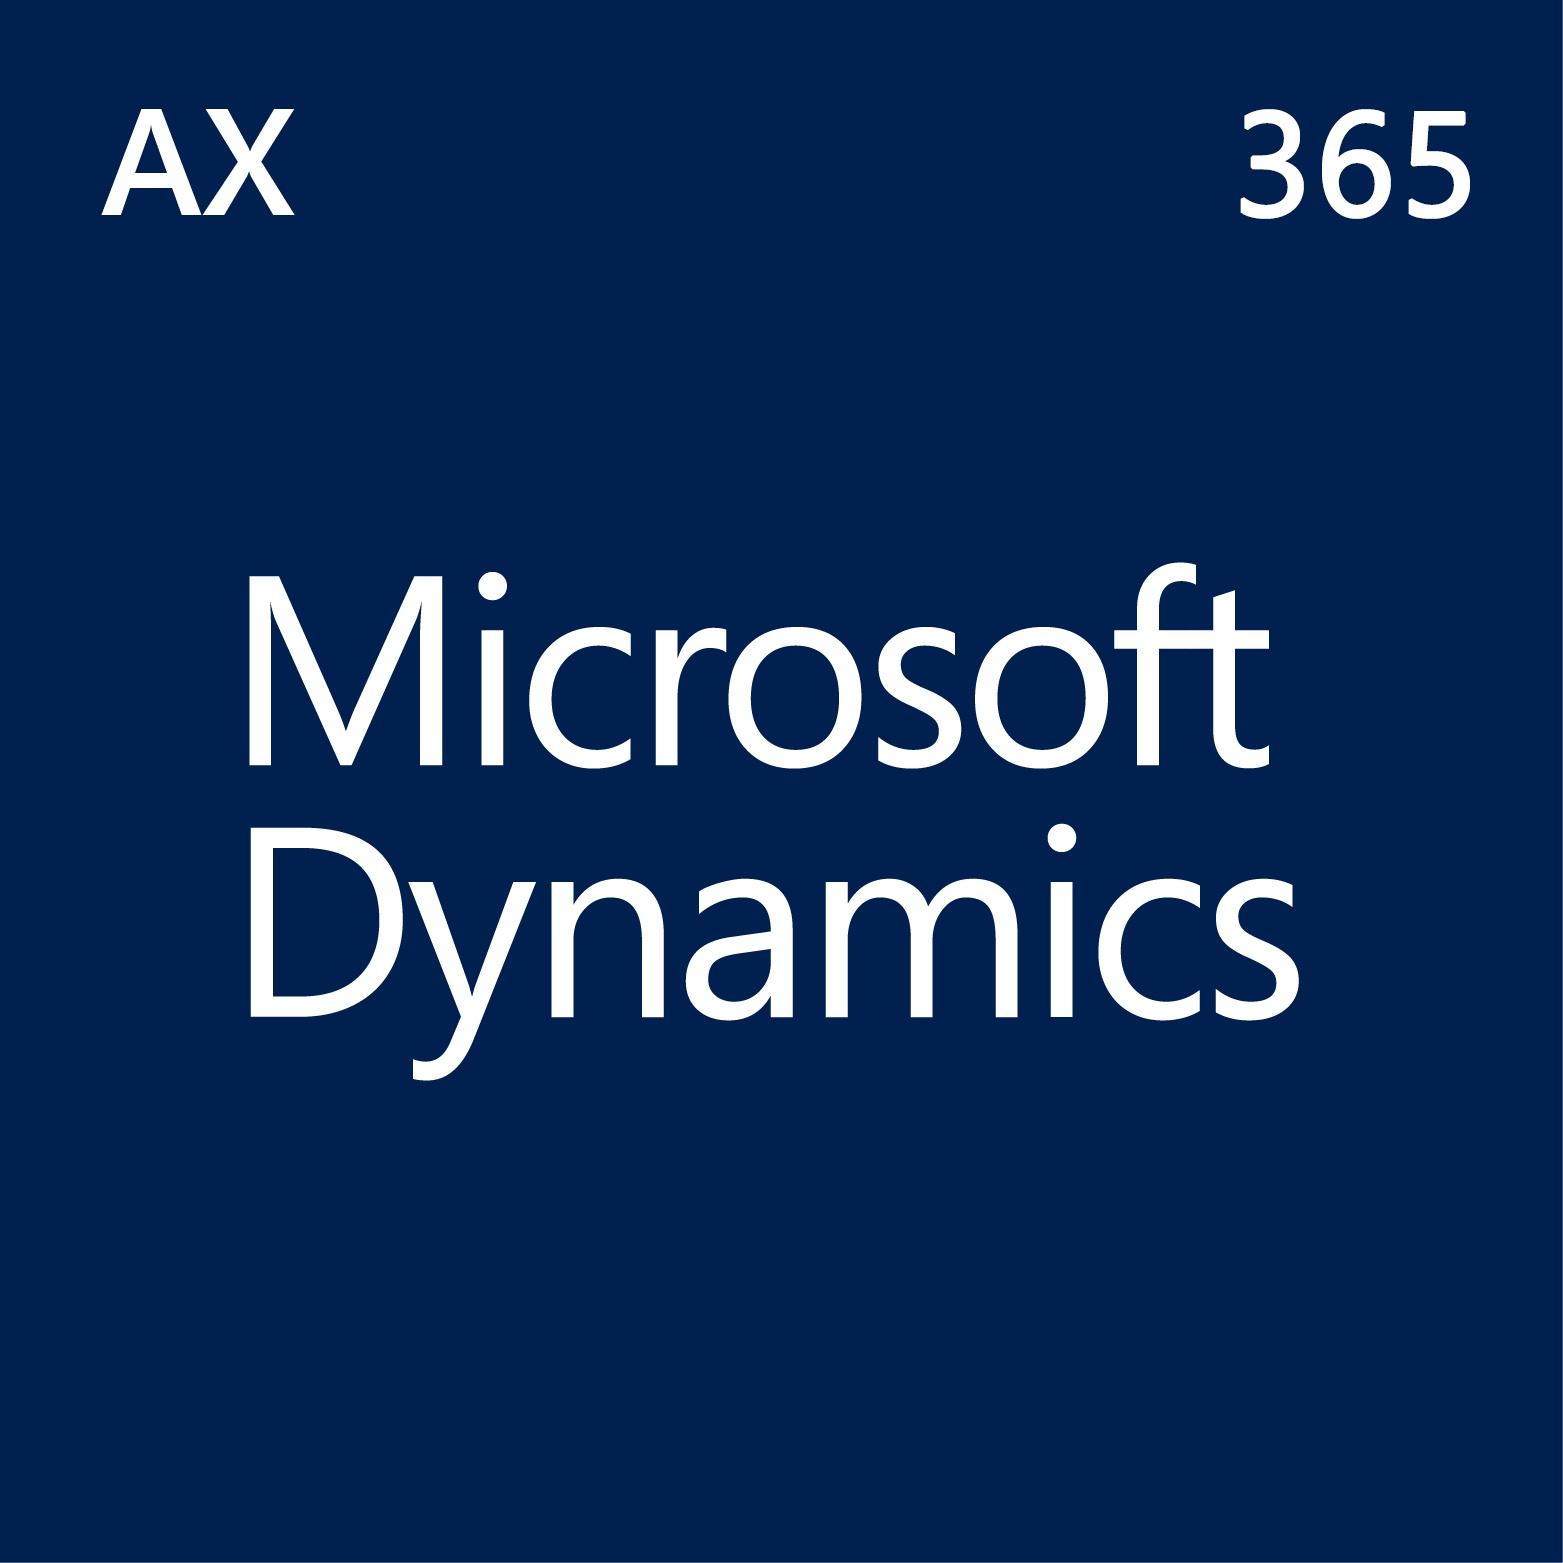 AX 365 logo.jpg